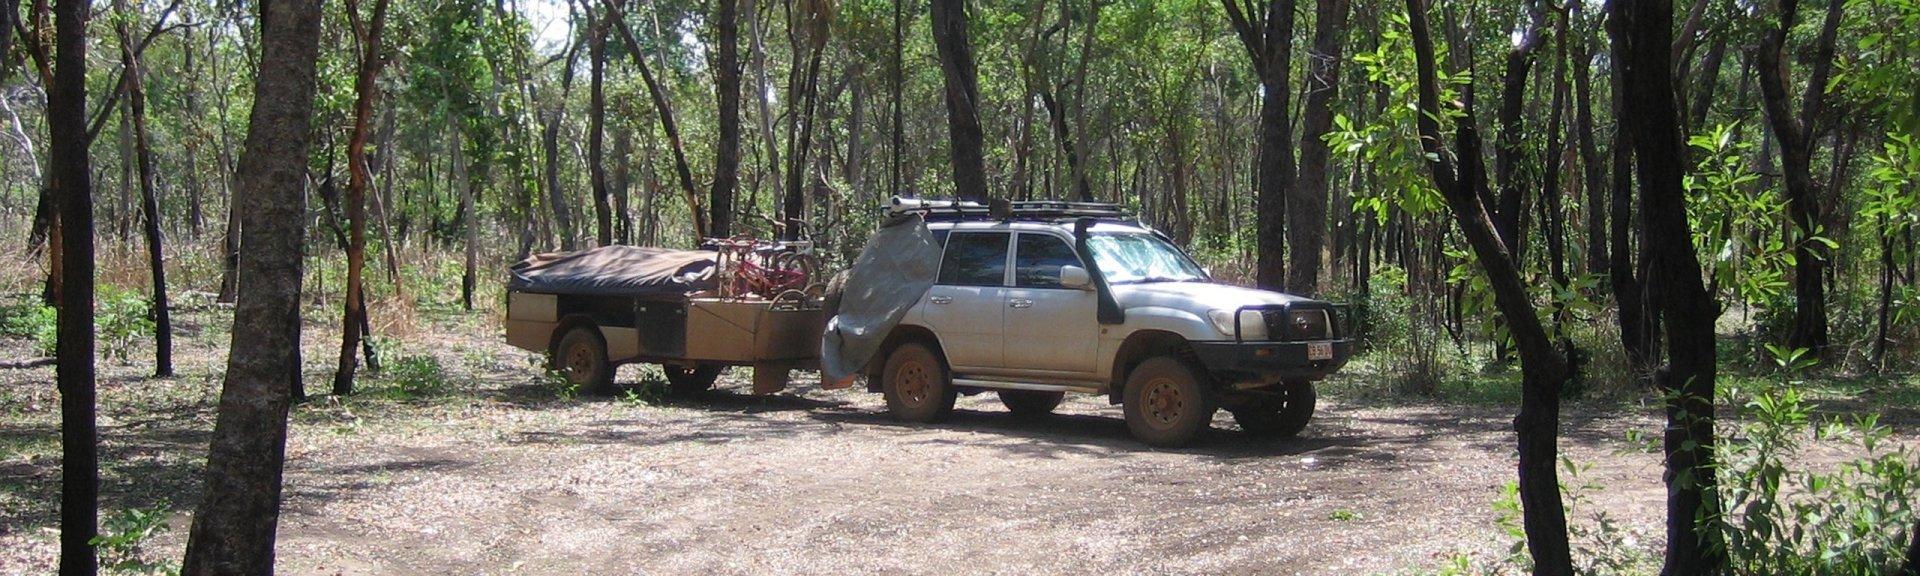 maguk-campground